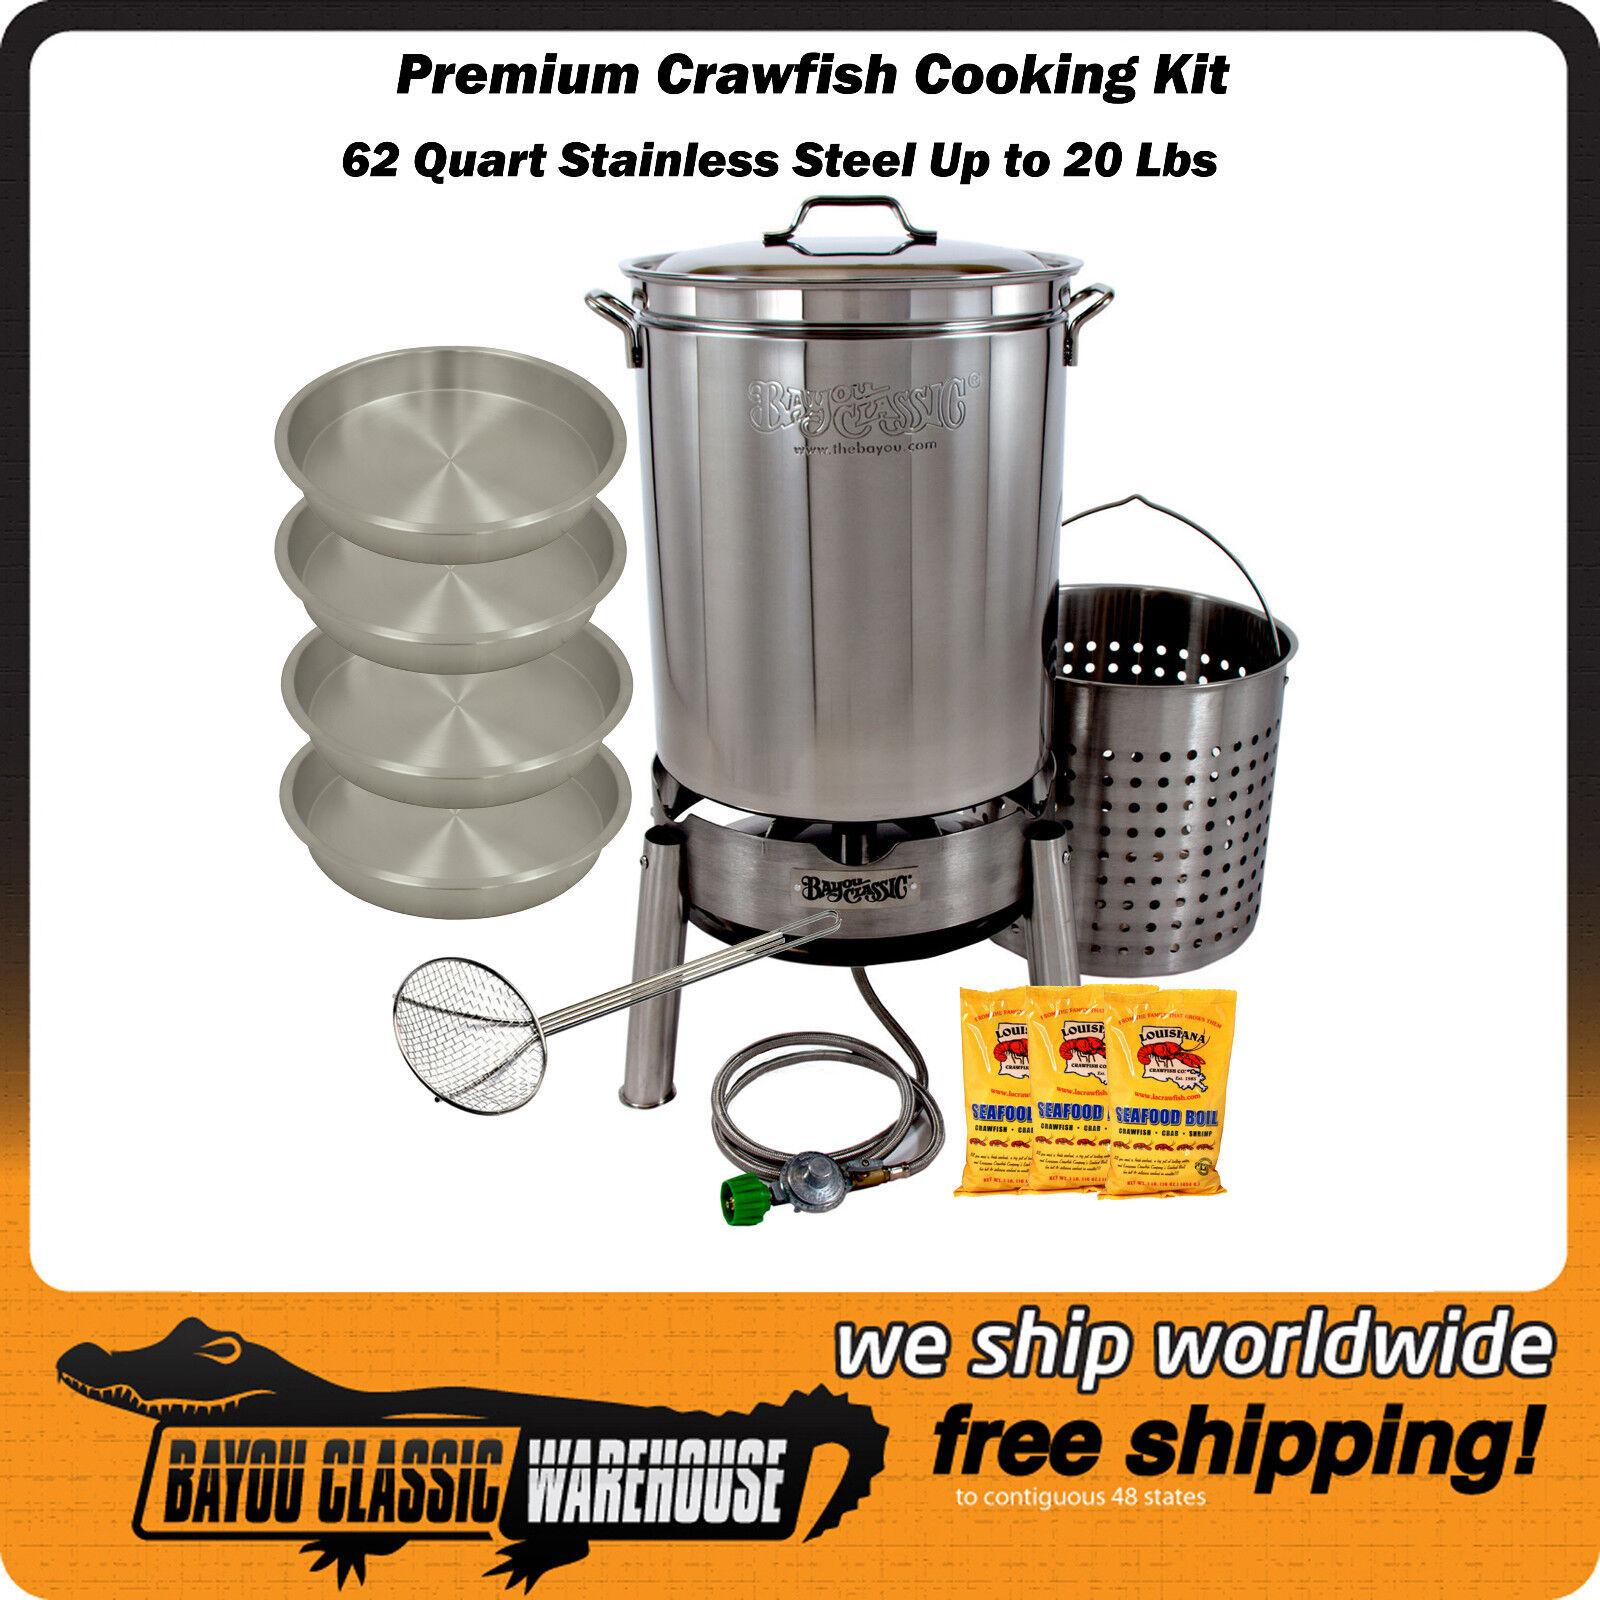 Crawfish Cooking Kit 62 Quart Premium Stainless Steel Hold up to 20 Lbs